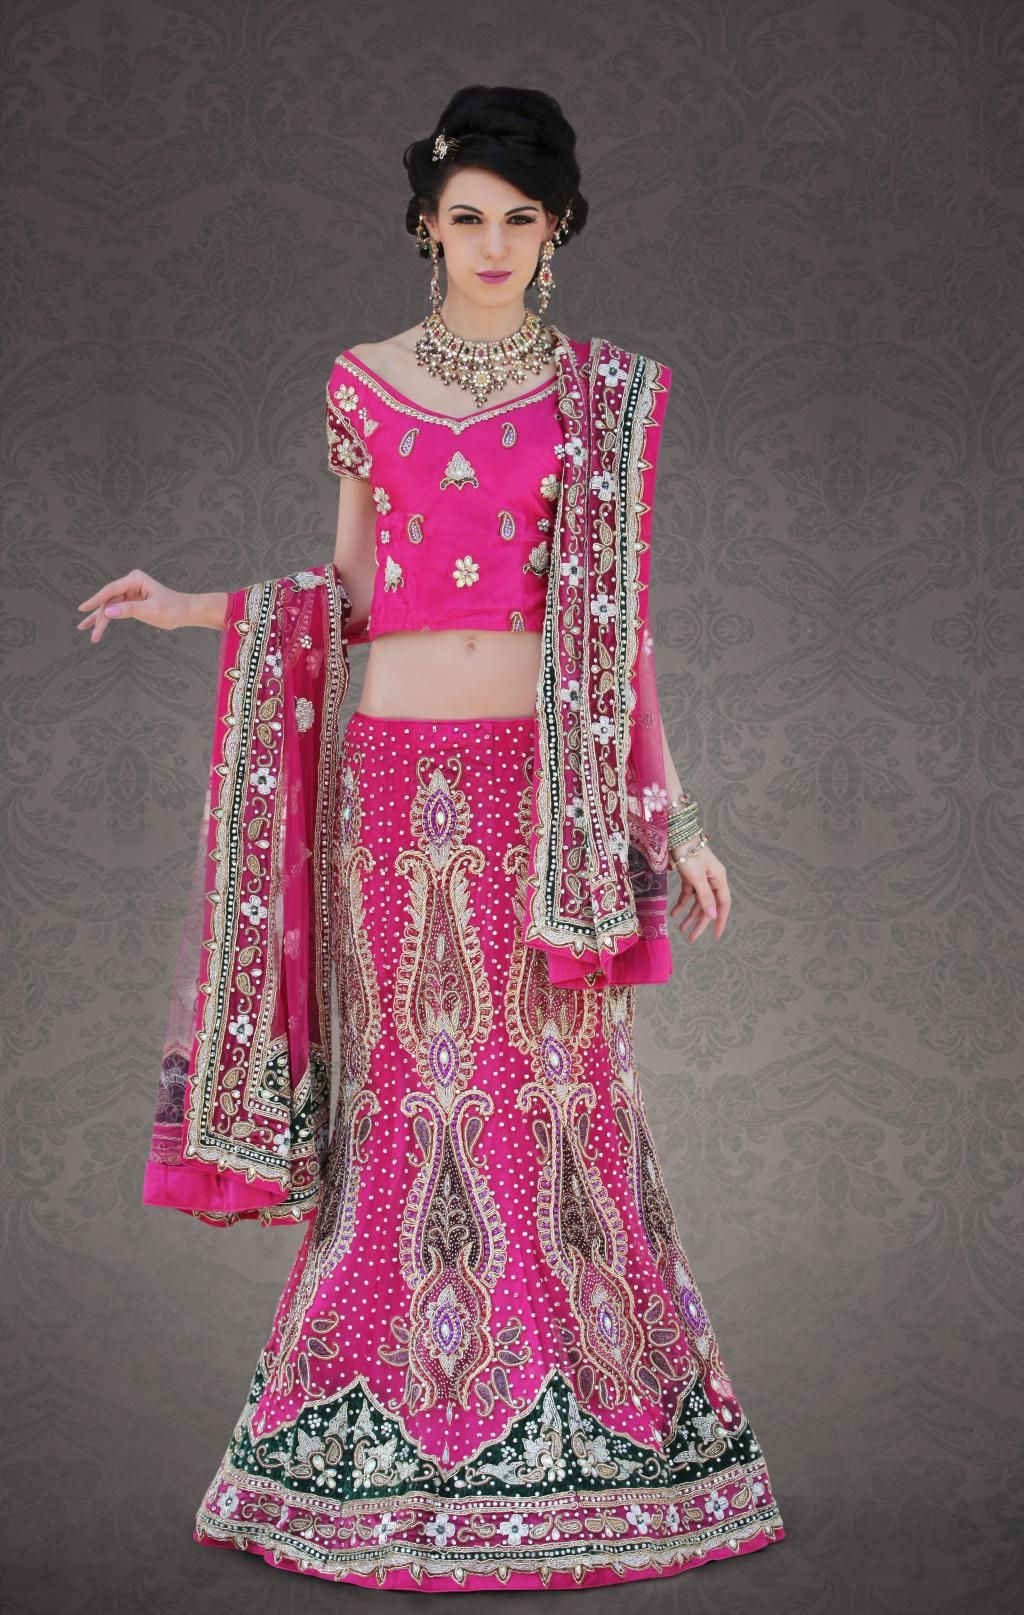 Pink #Bridal Pink #Lehenga | Indian Bridal Dresses | Pinterest